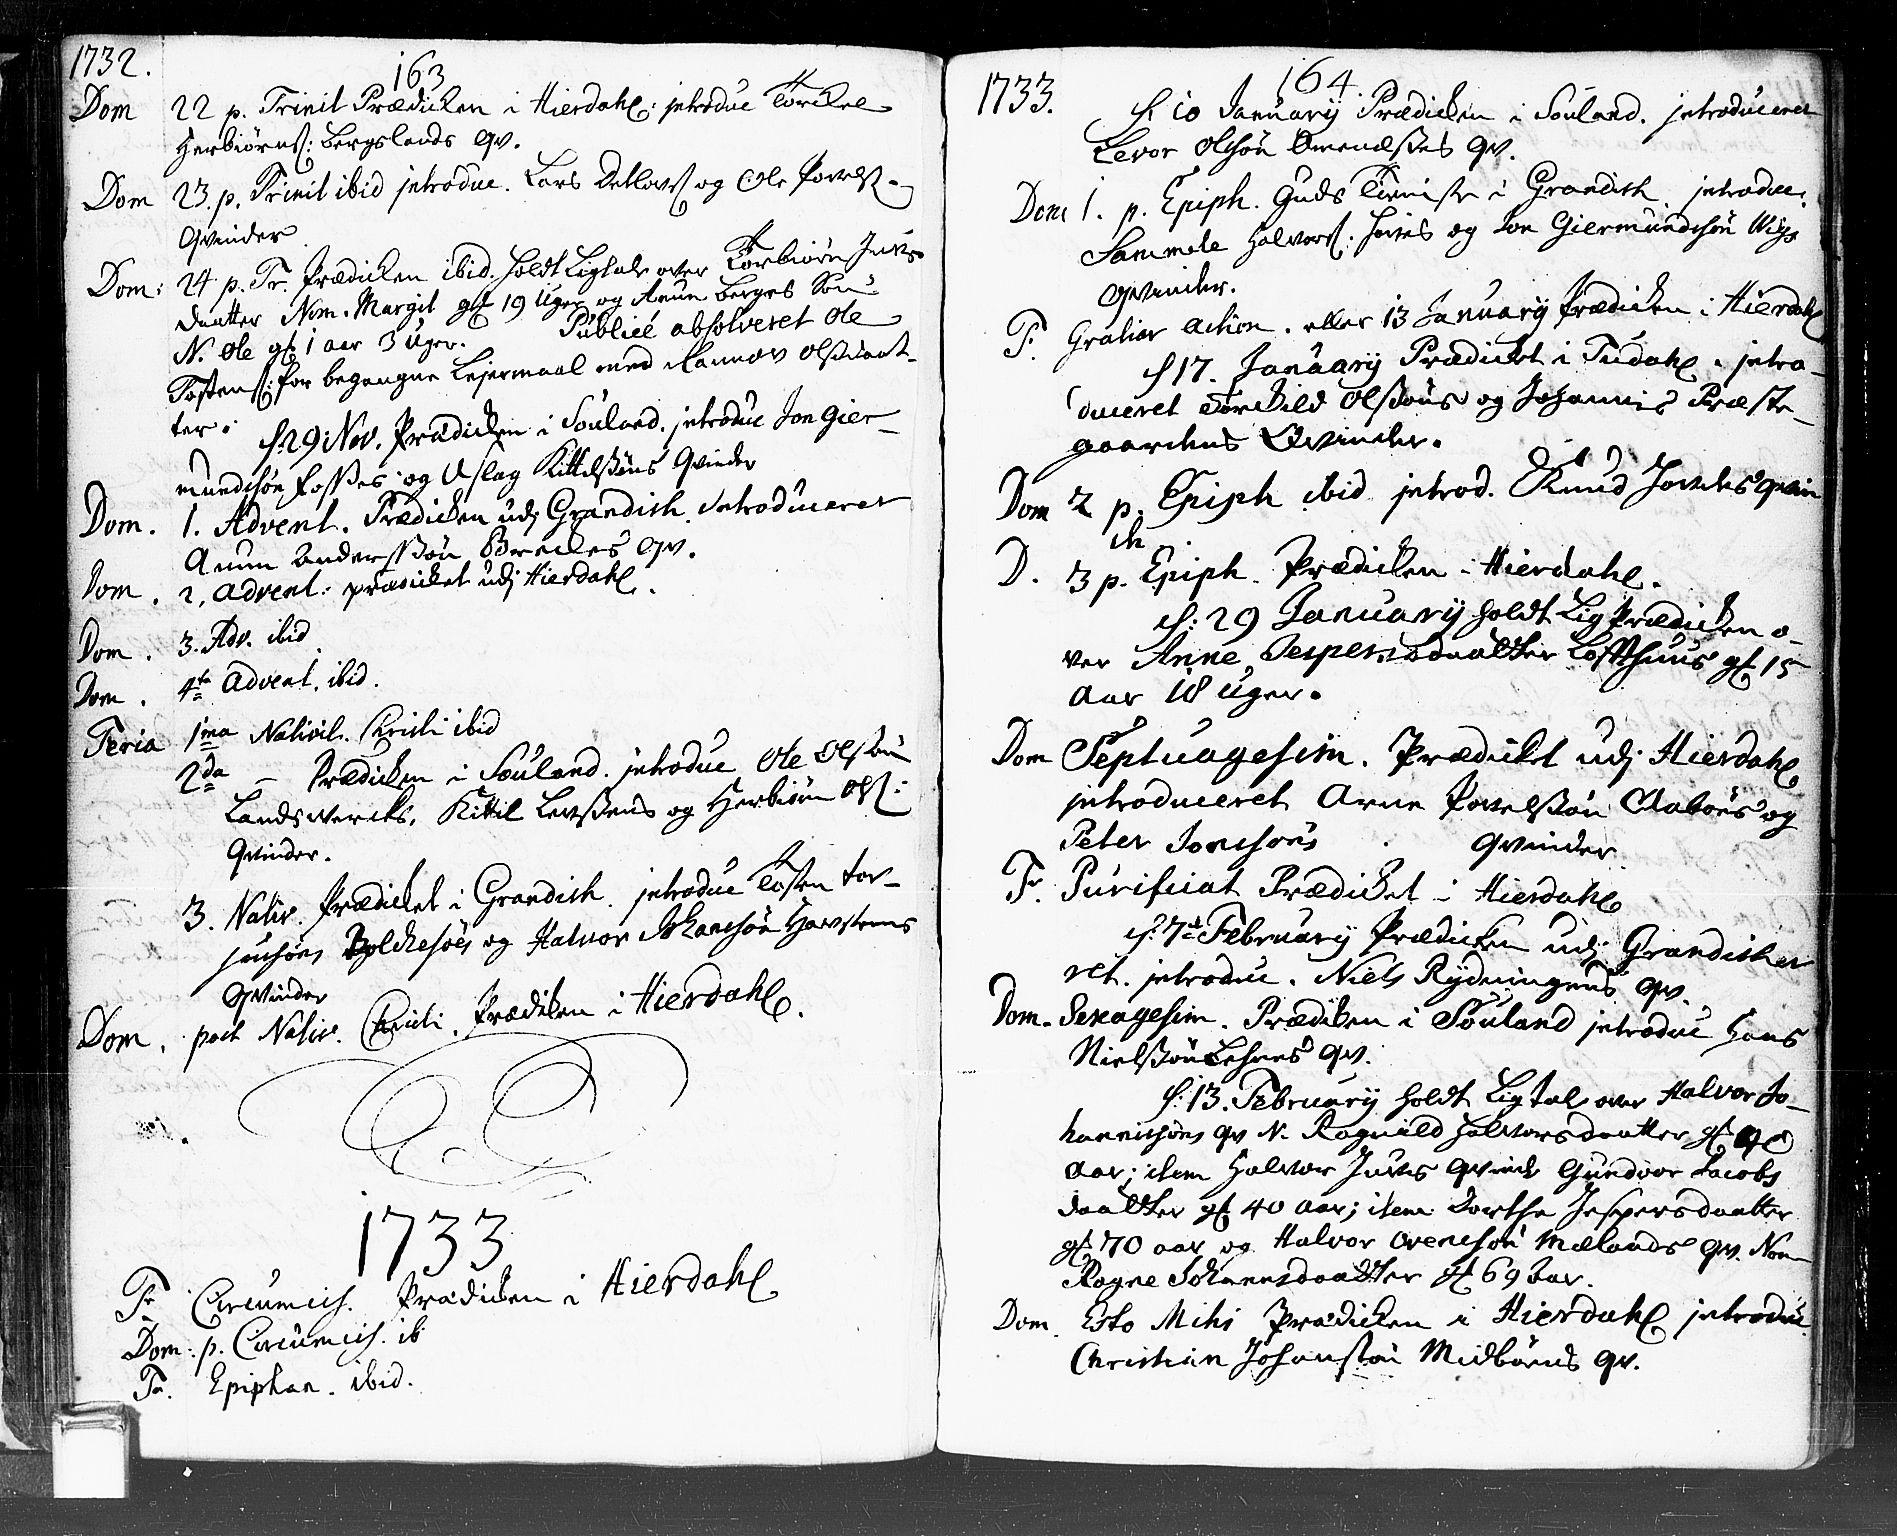 SAKO, Hjartdal kirkebøker, F/Fa/L0002: Ministerialbok nr. I 2, 1716-1754, s. 163-164